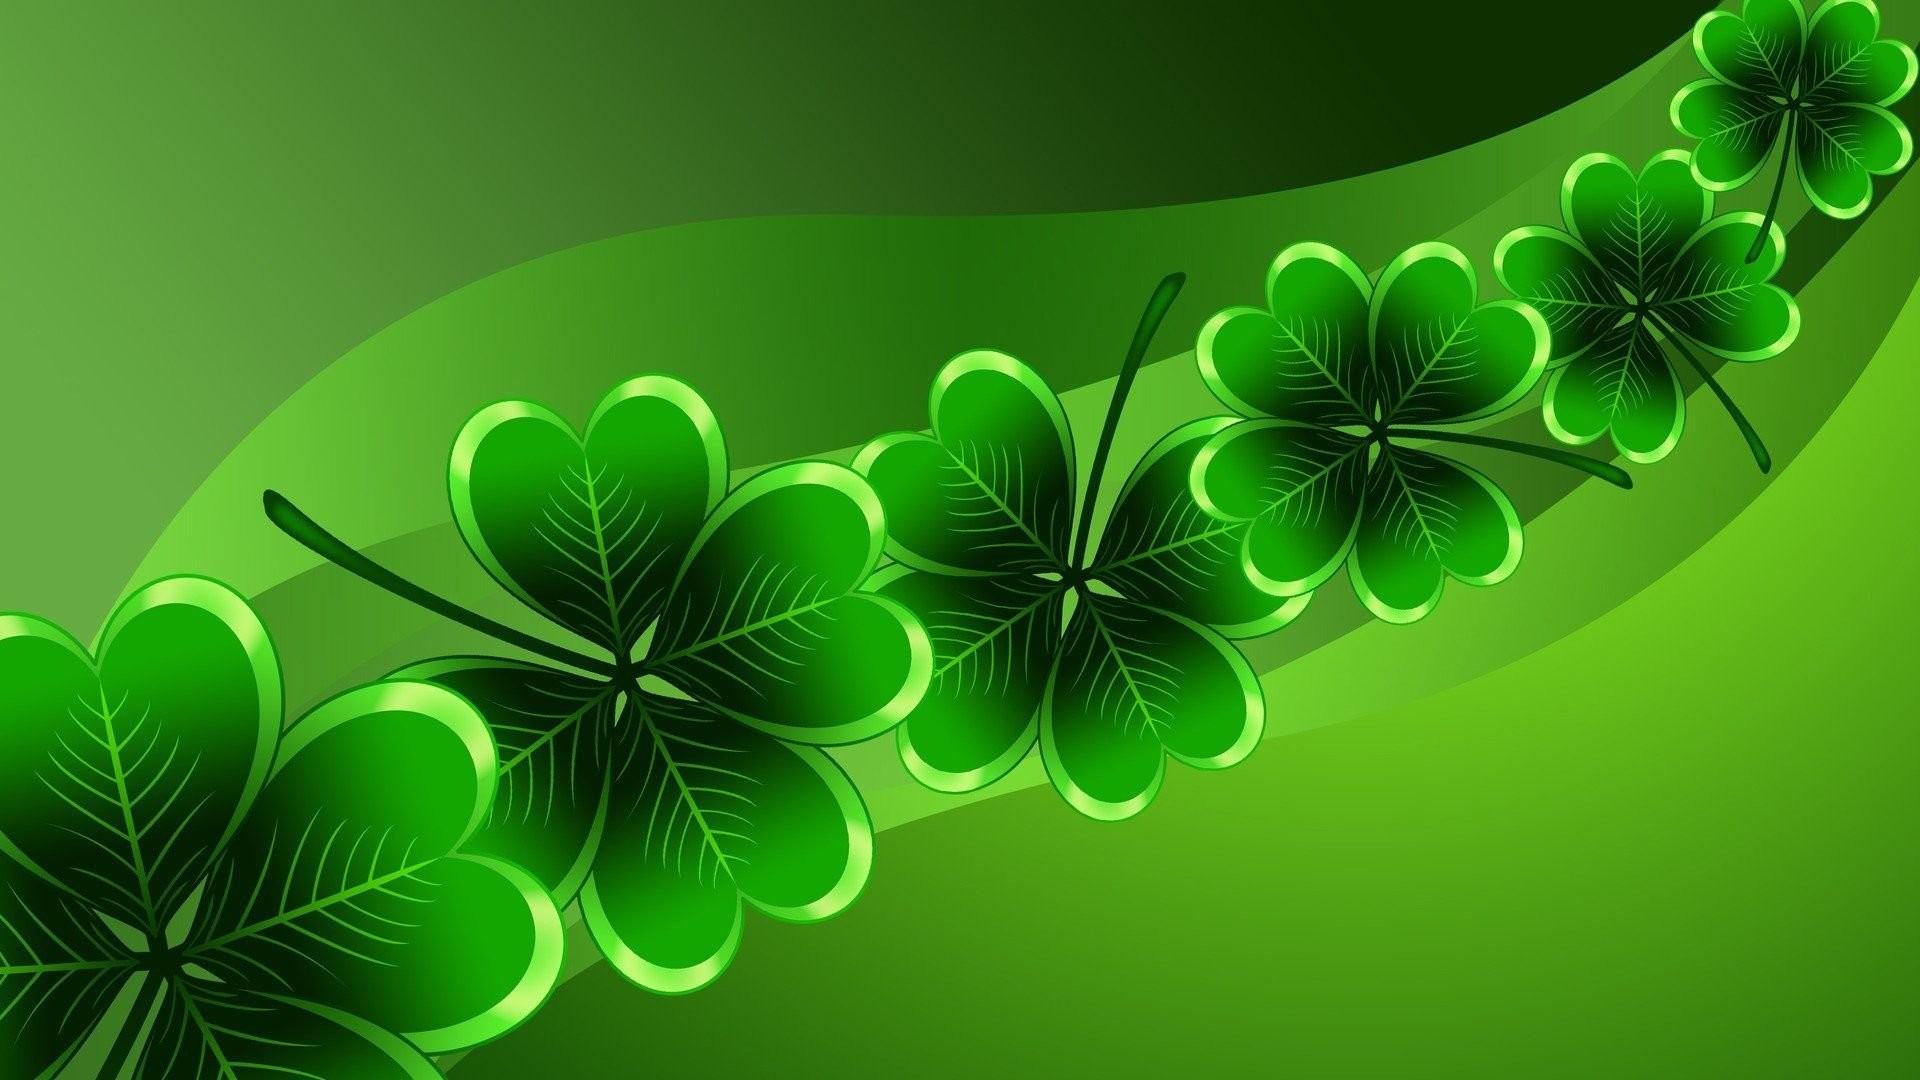 Green Clover wallpaper for desktop